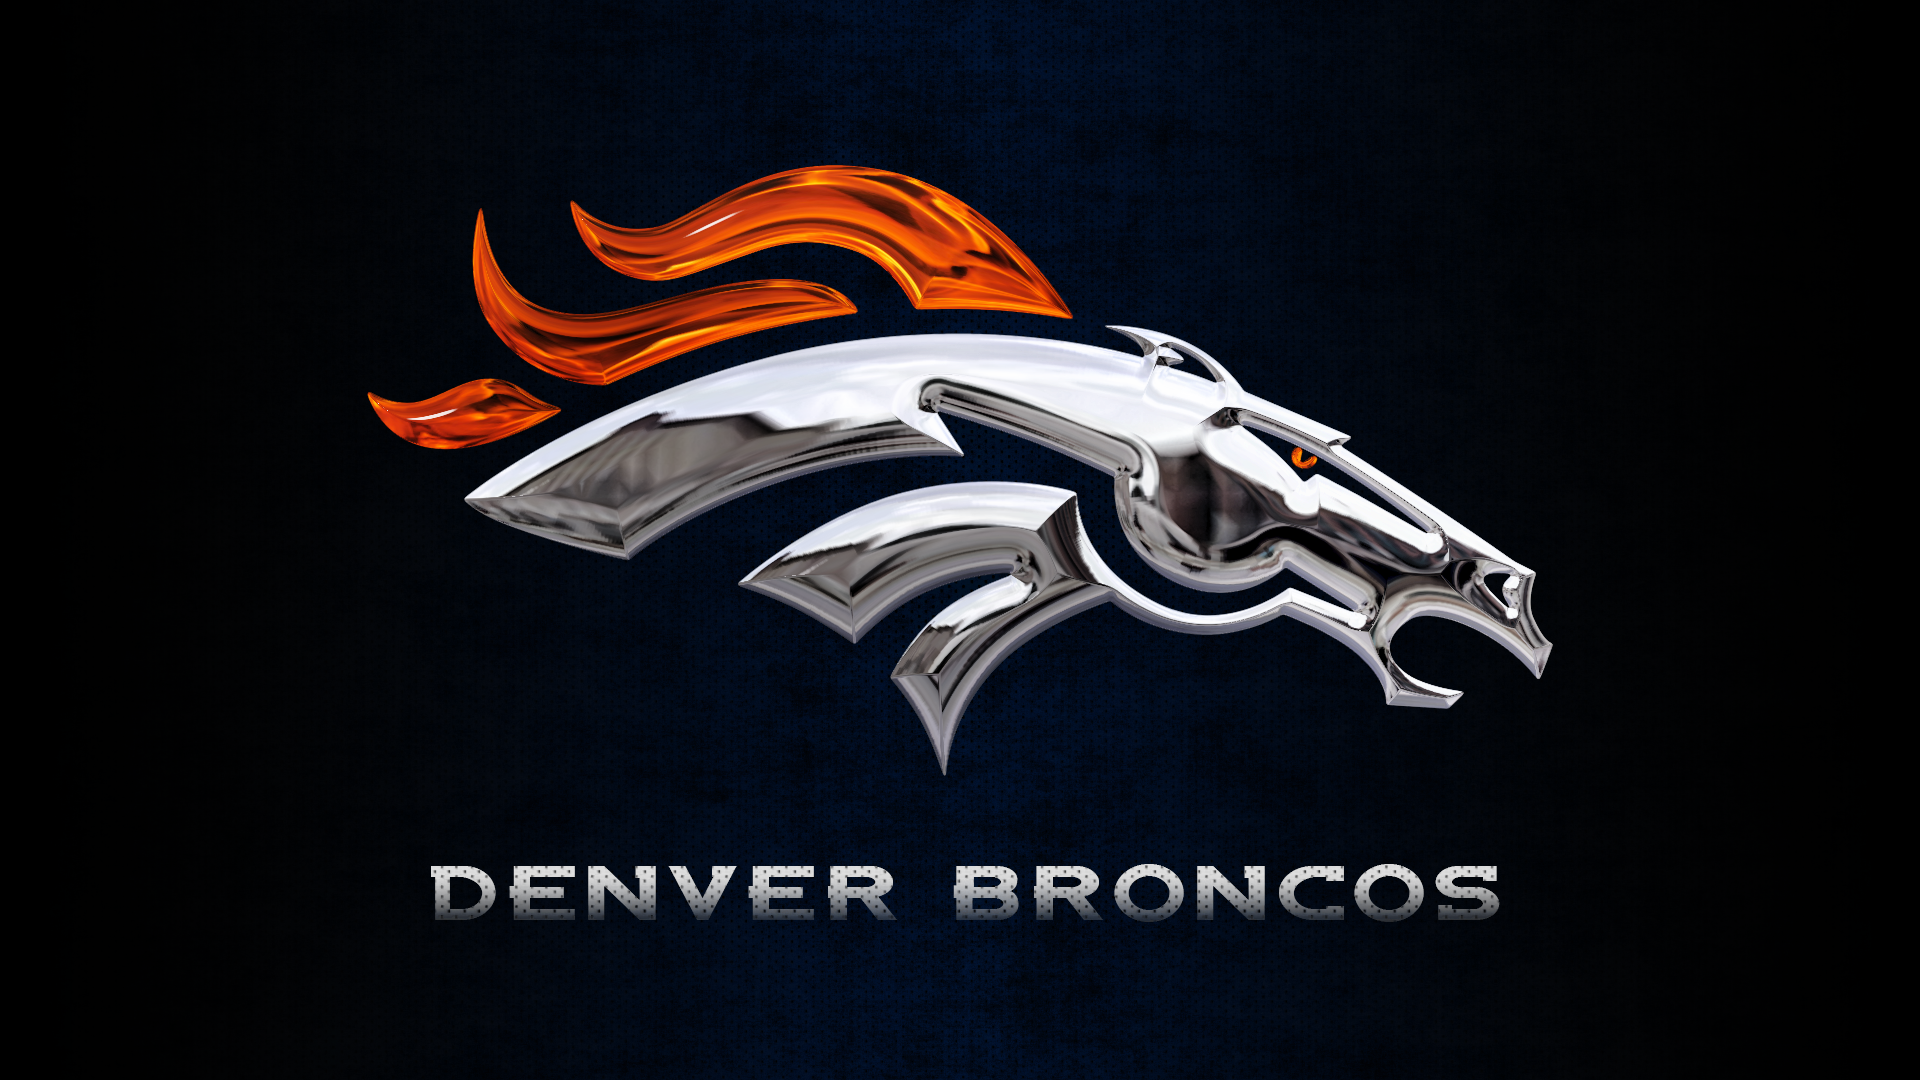 Denver broncos wallpaper pictures